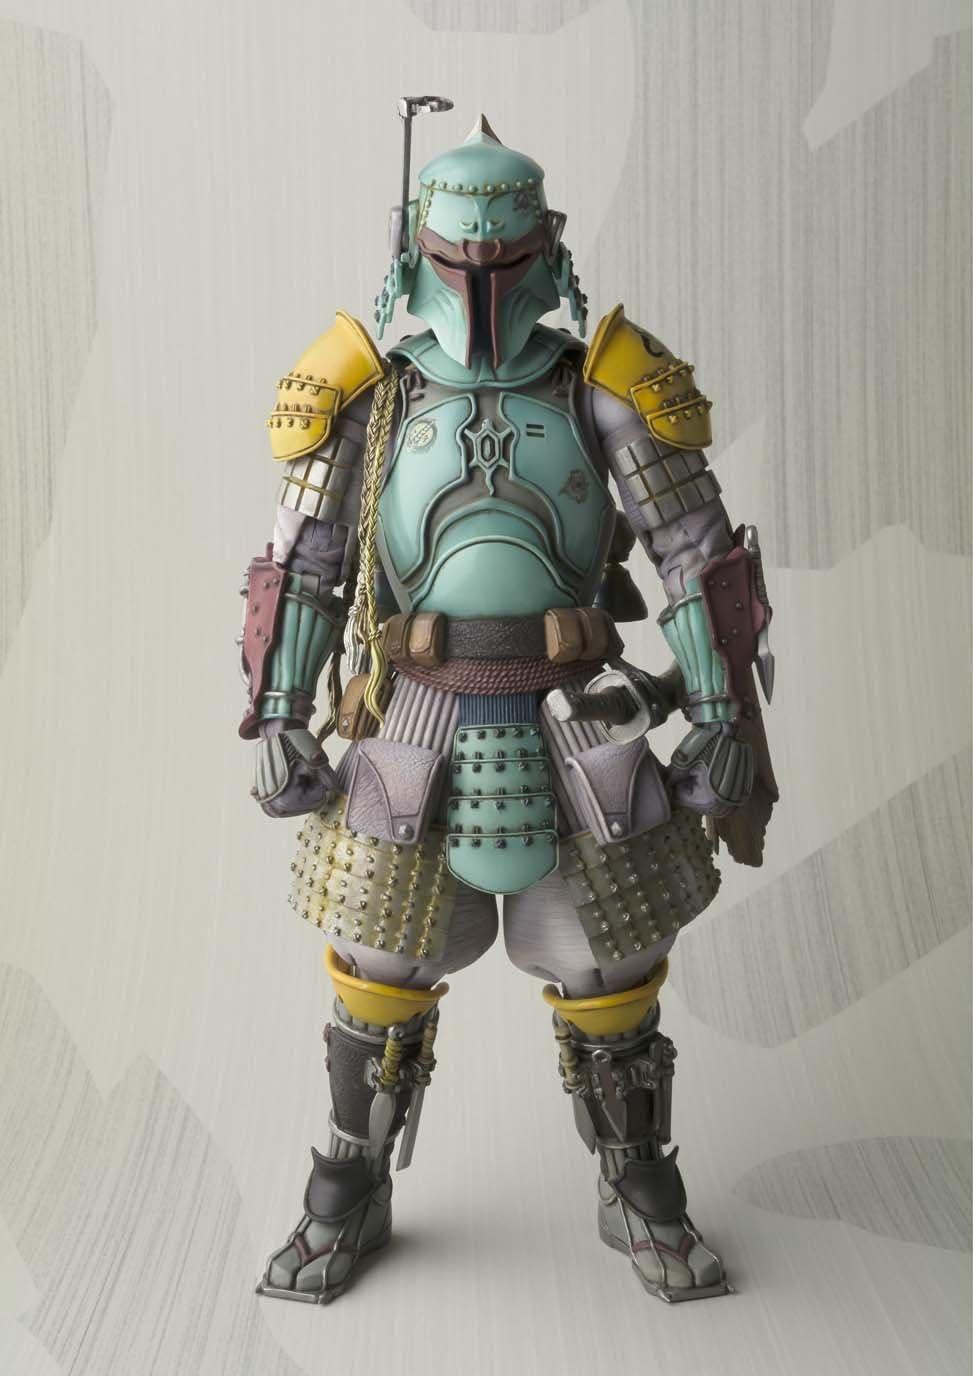 Star Wars Movie Realization Ronin Samurai Boba Fett PVC Action Figure New In Box